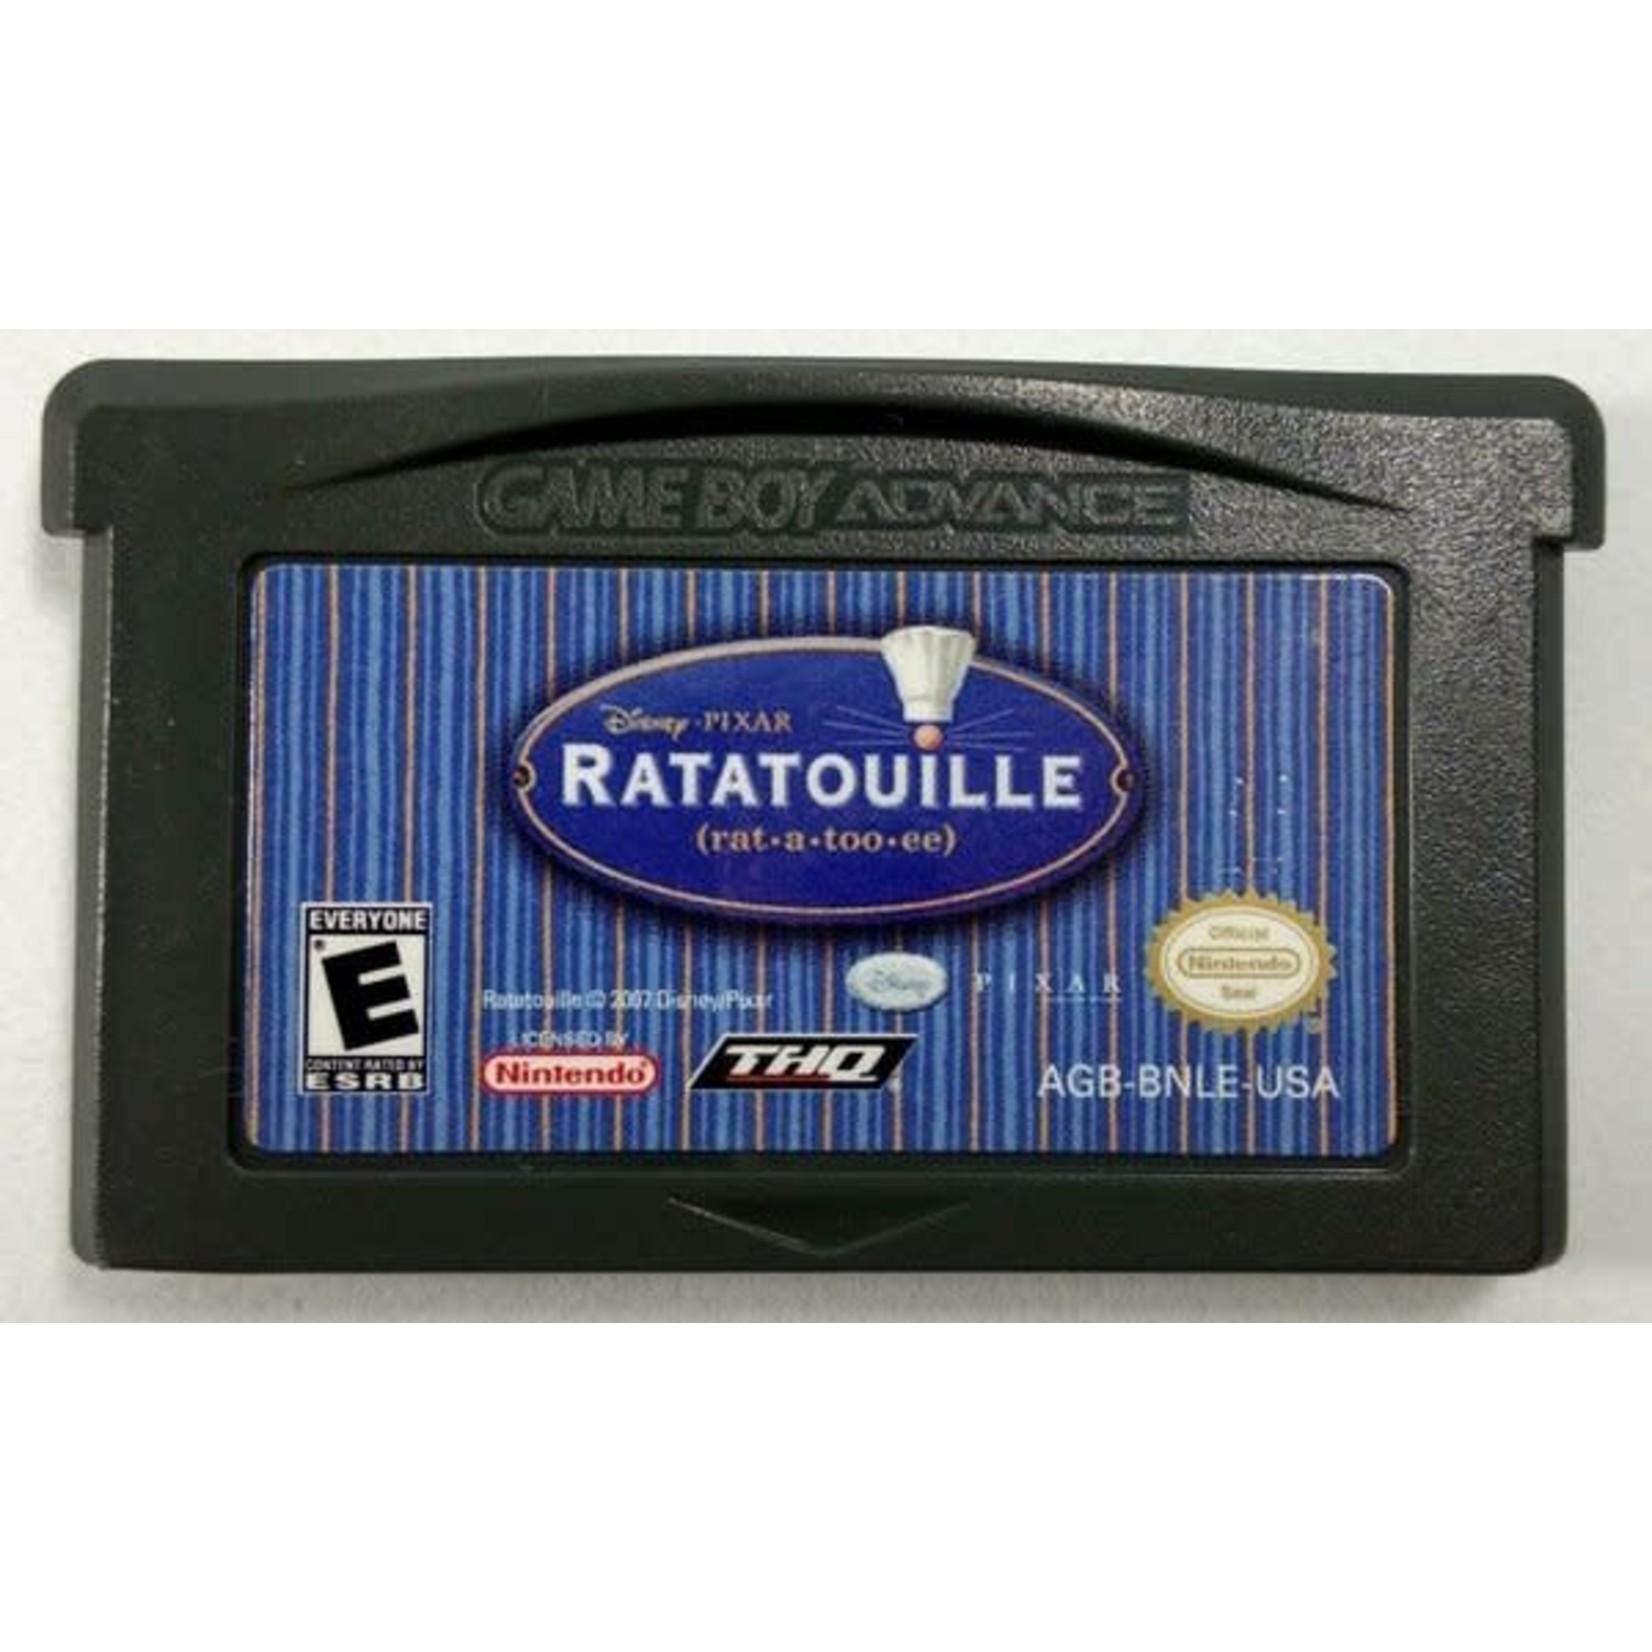 gbau-Ratatouille (cartridge)